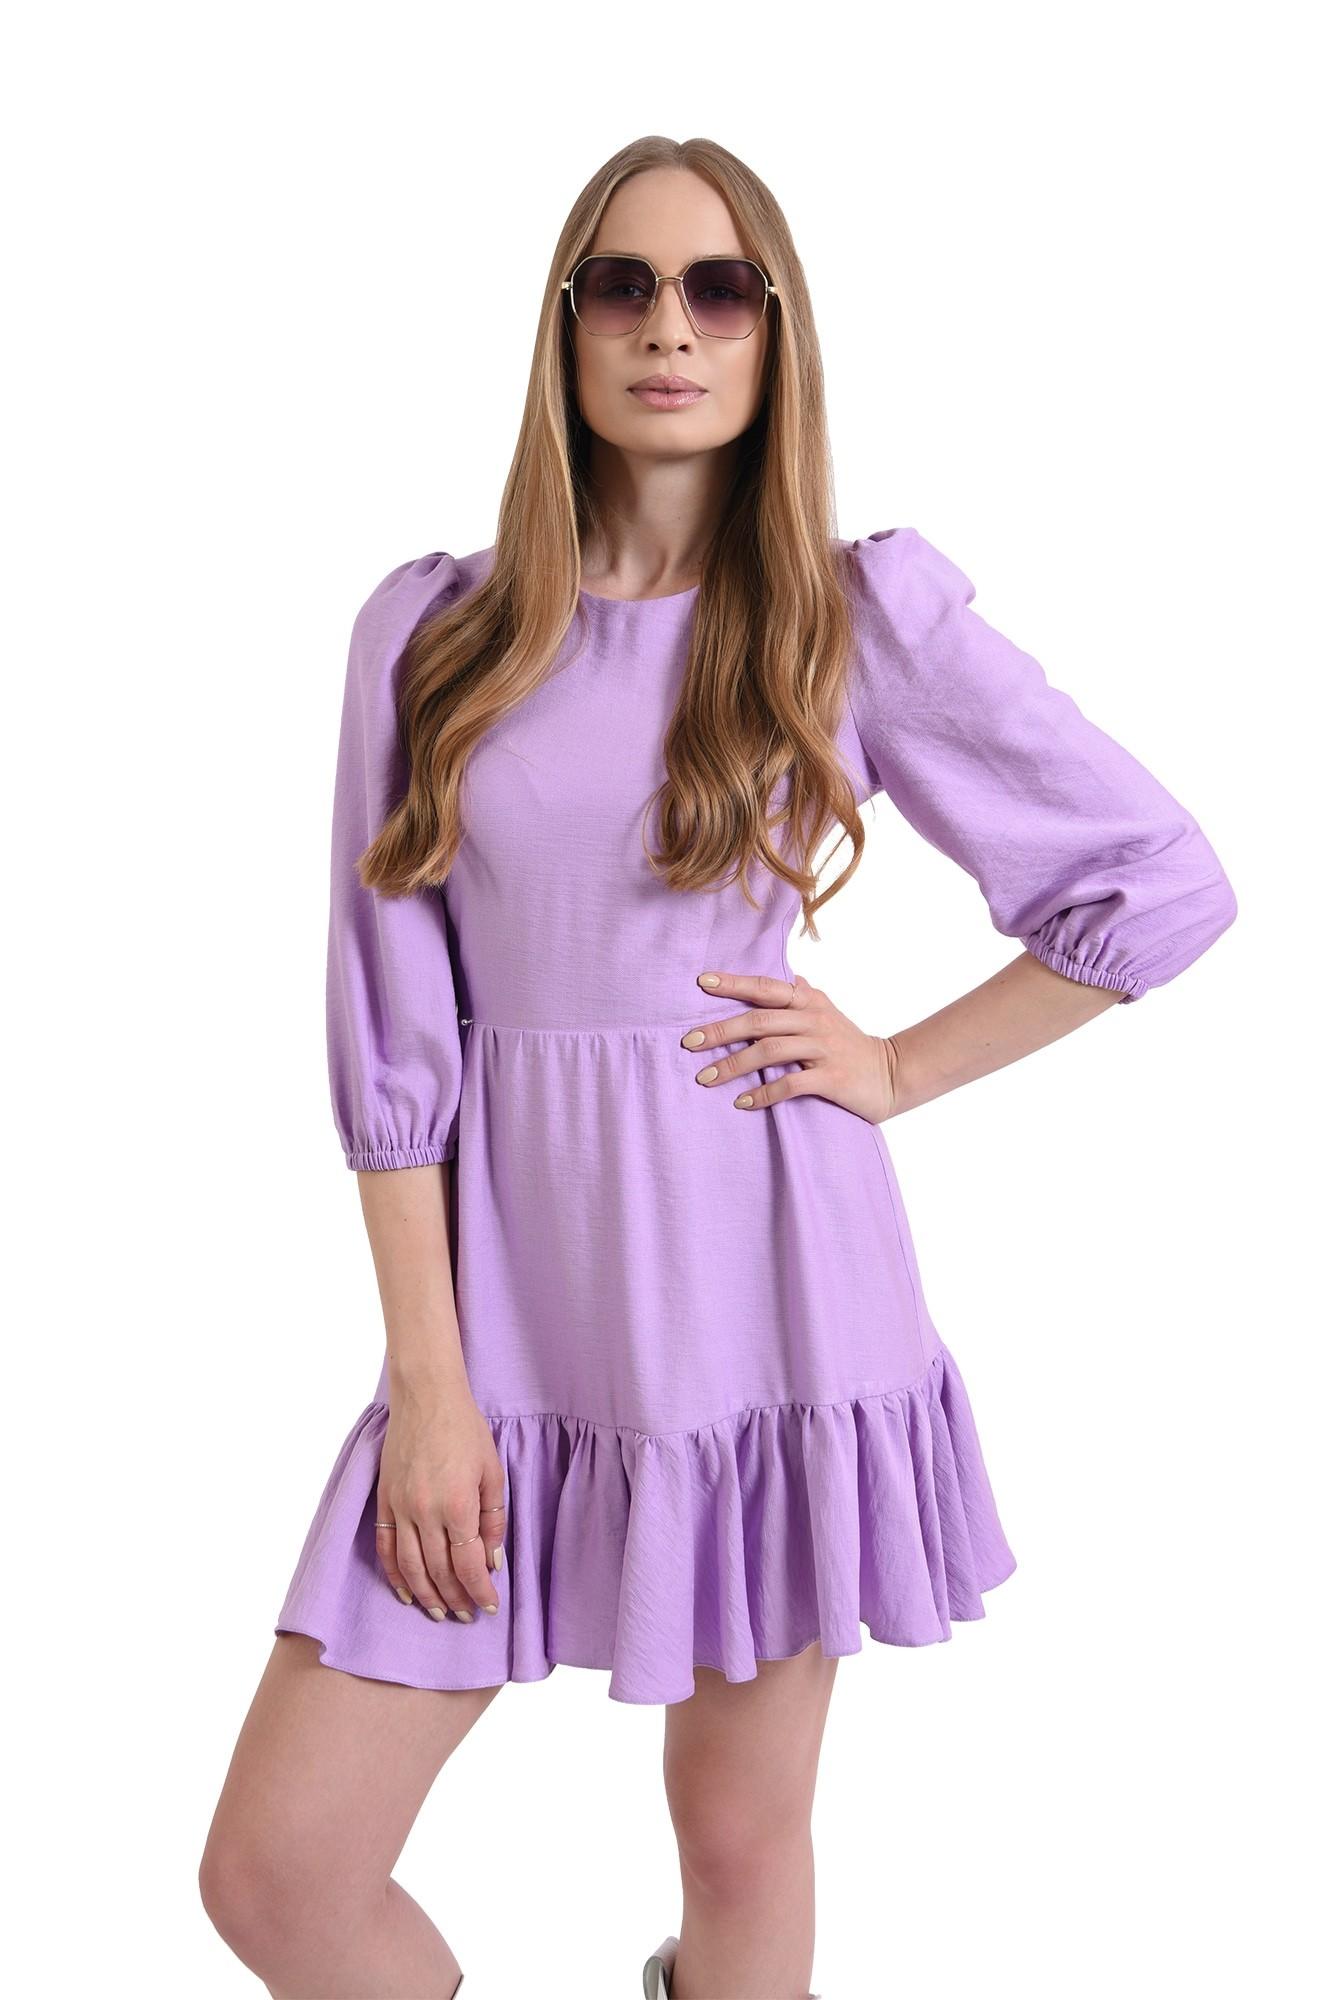 3 - rochie mini, lila, evazata, cu volan